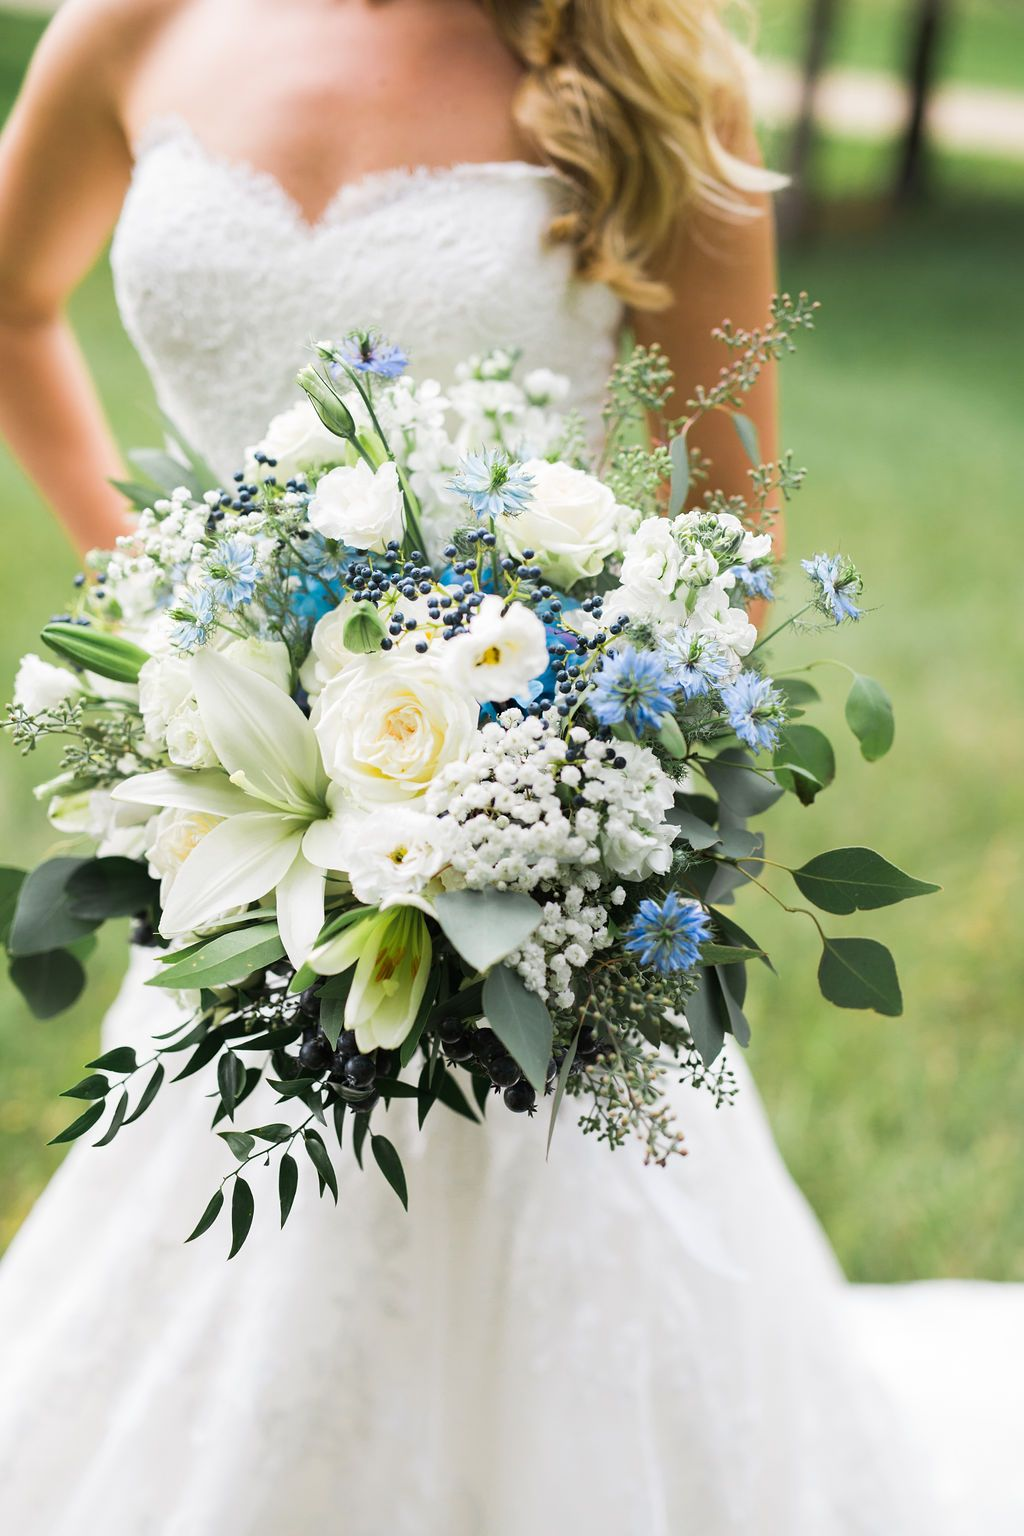 Haley chose a white and blue bridalbouquet. Blue